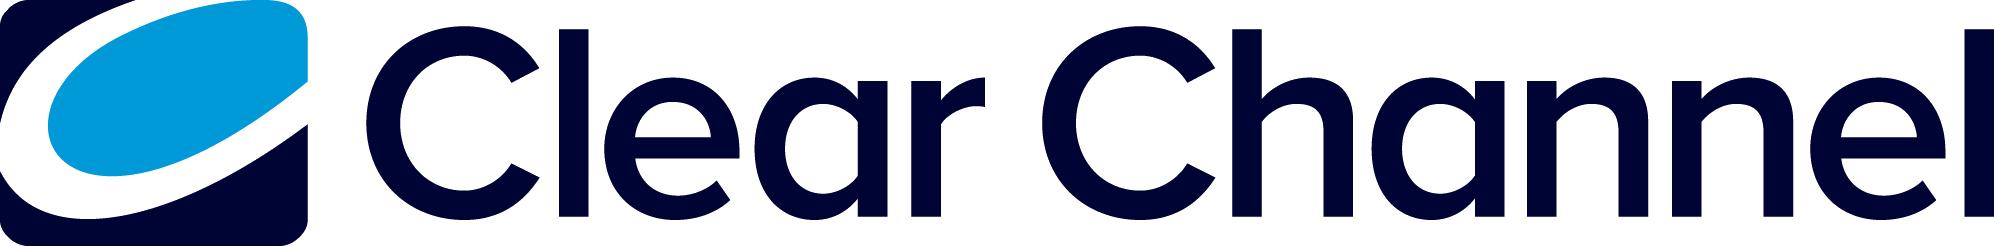 cc-logo-ei-taustaa-vektoroitu.png (105 KB)